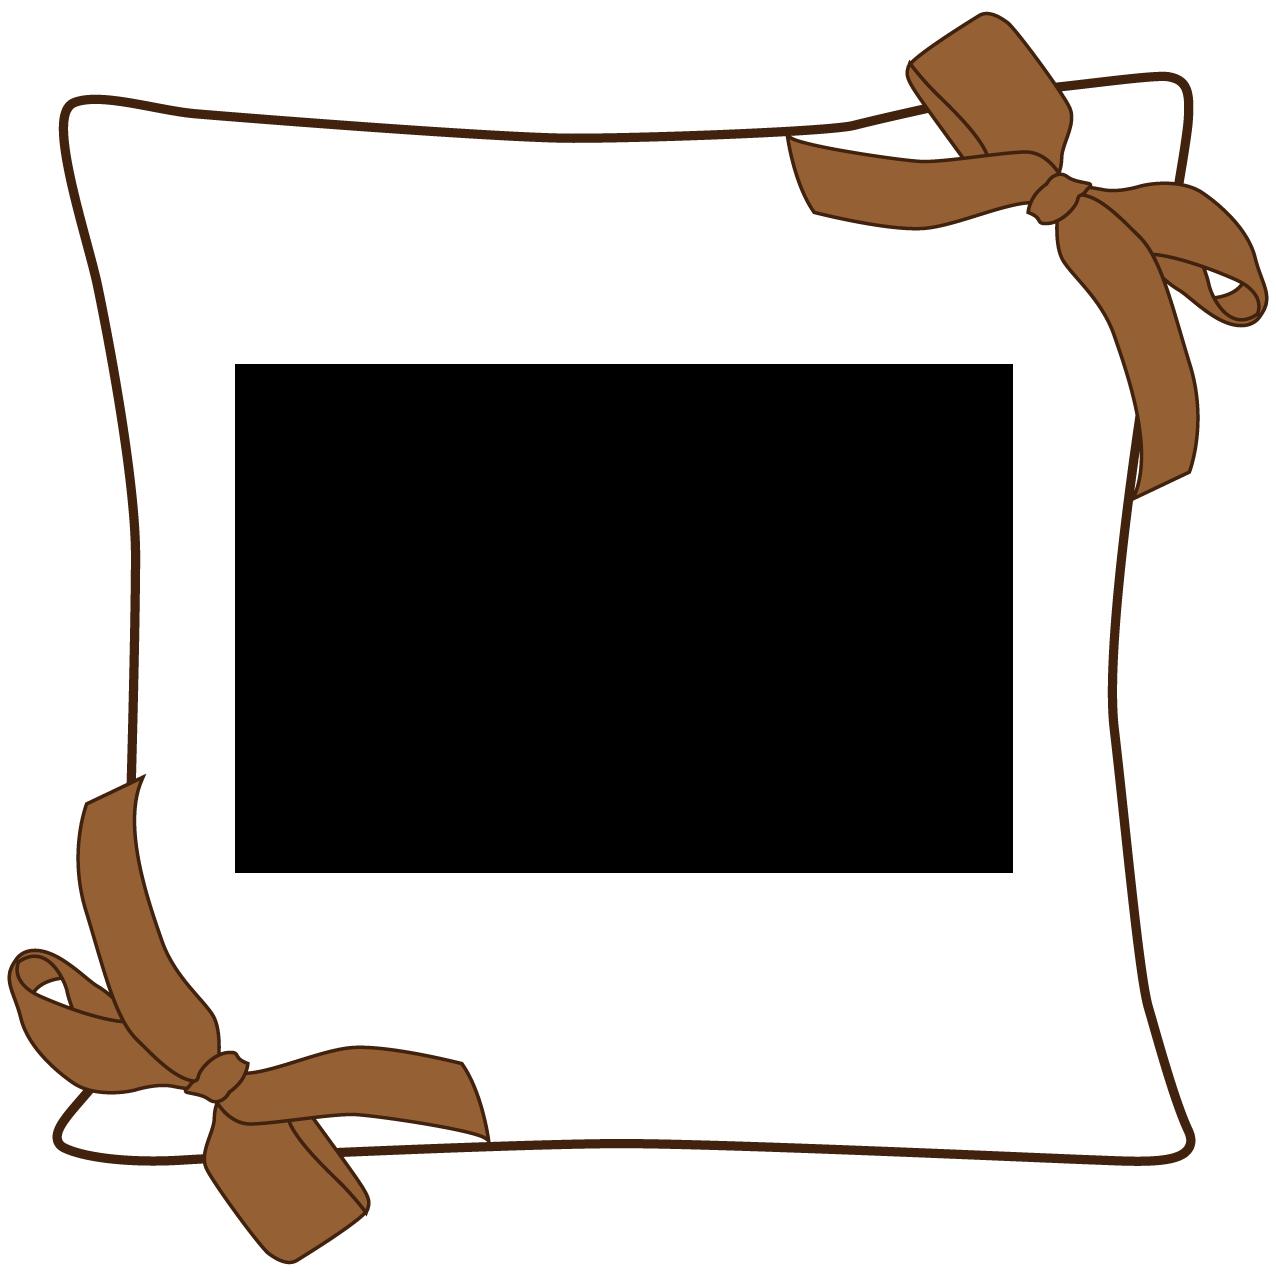 ppt 背景 背景图片 边框 模板 设计 矢量 矢量图 素材 相框 1276_1276